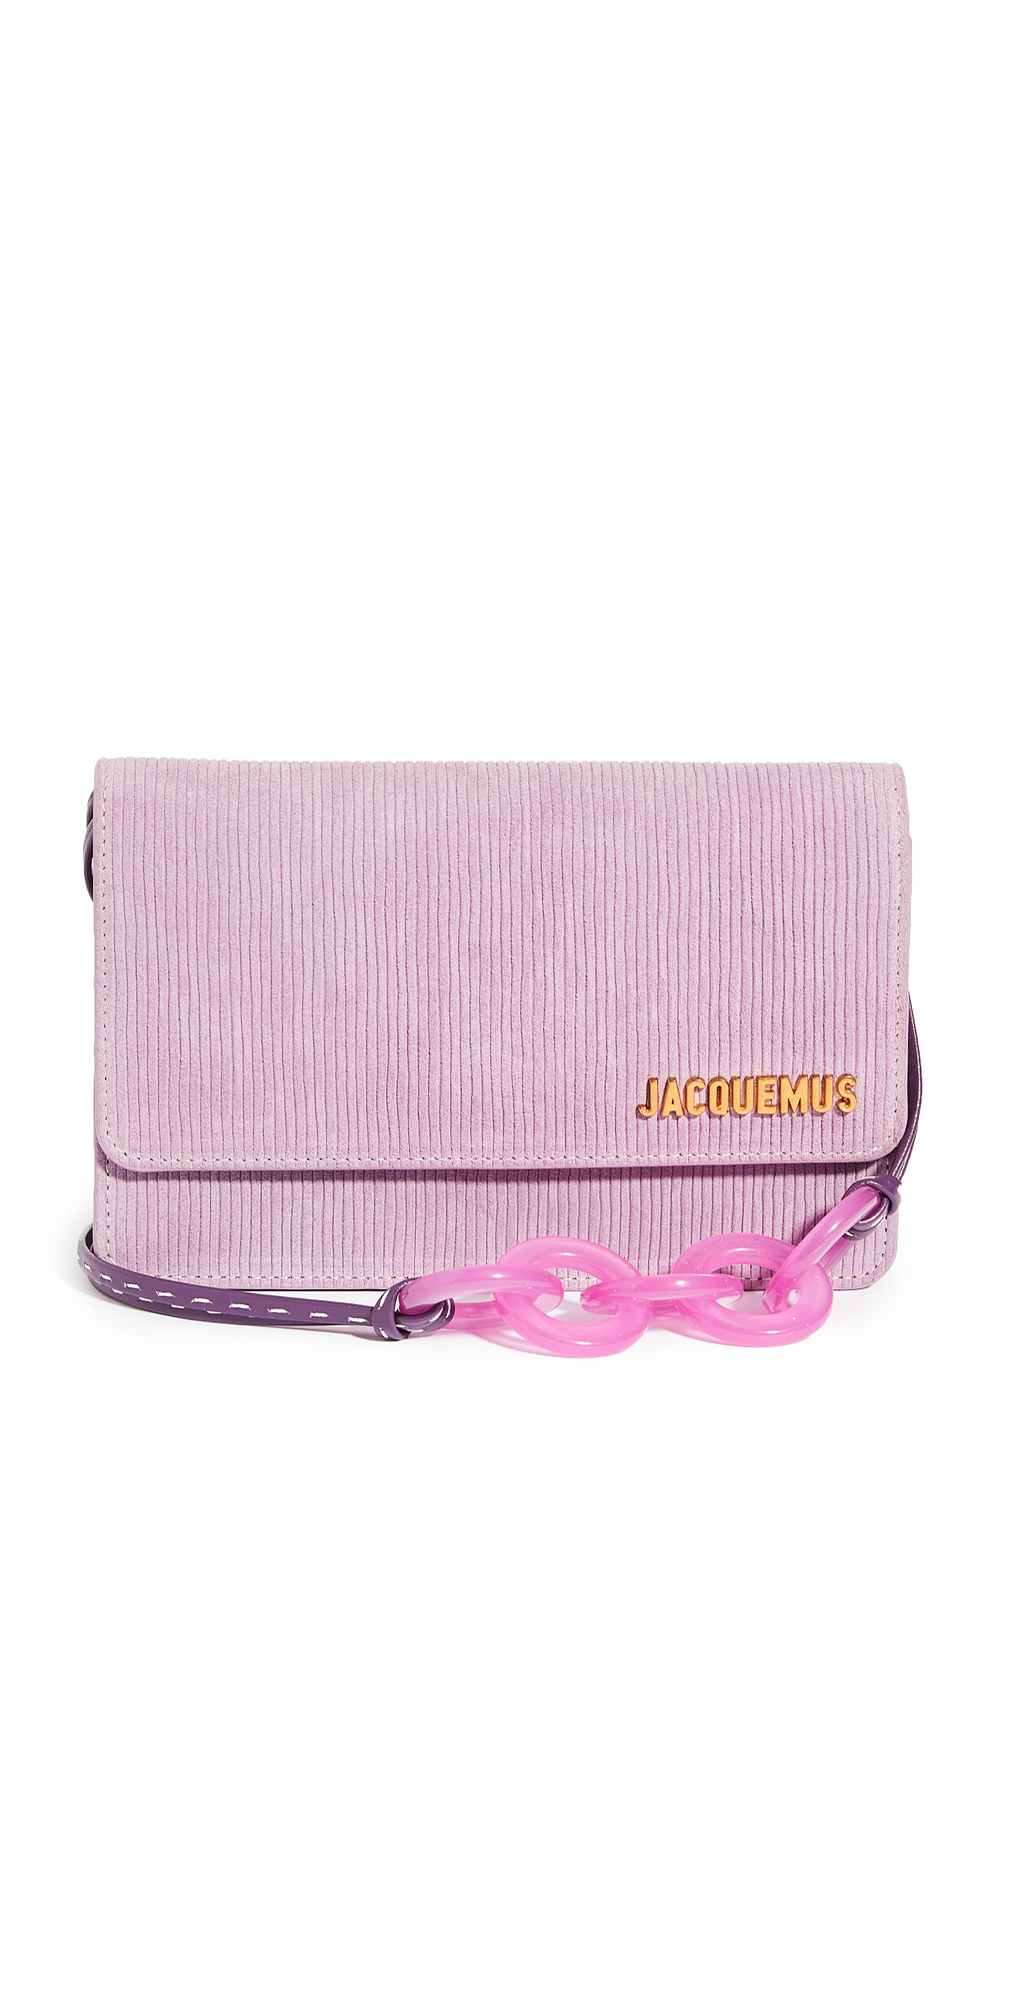 Jacquemus Le Riviera Bag